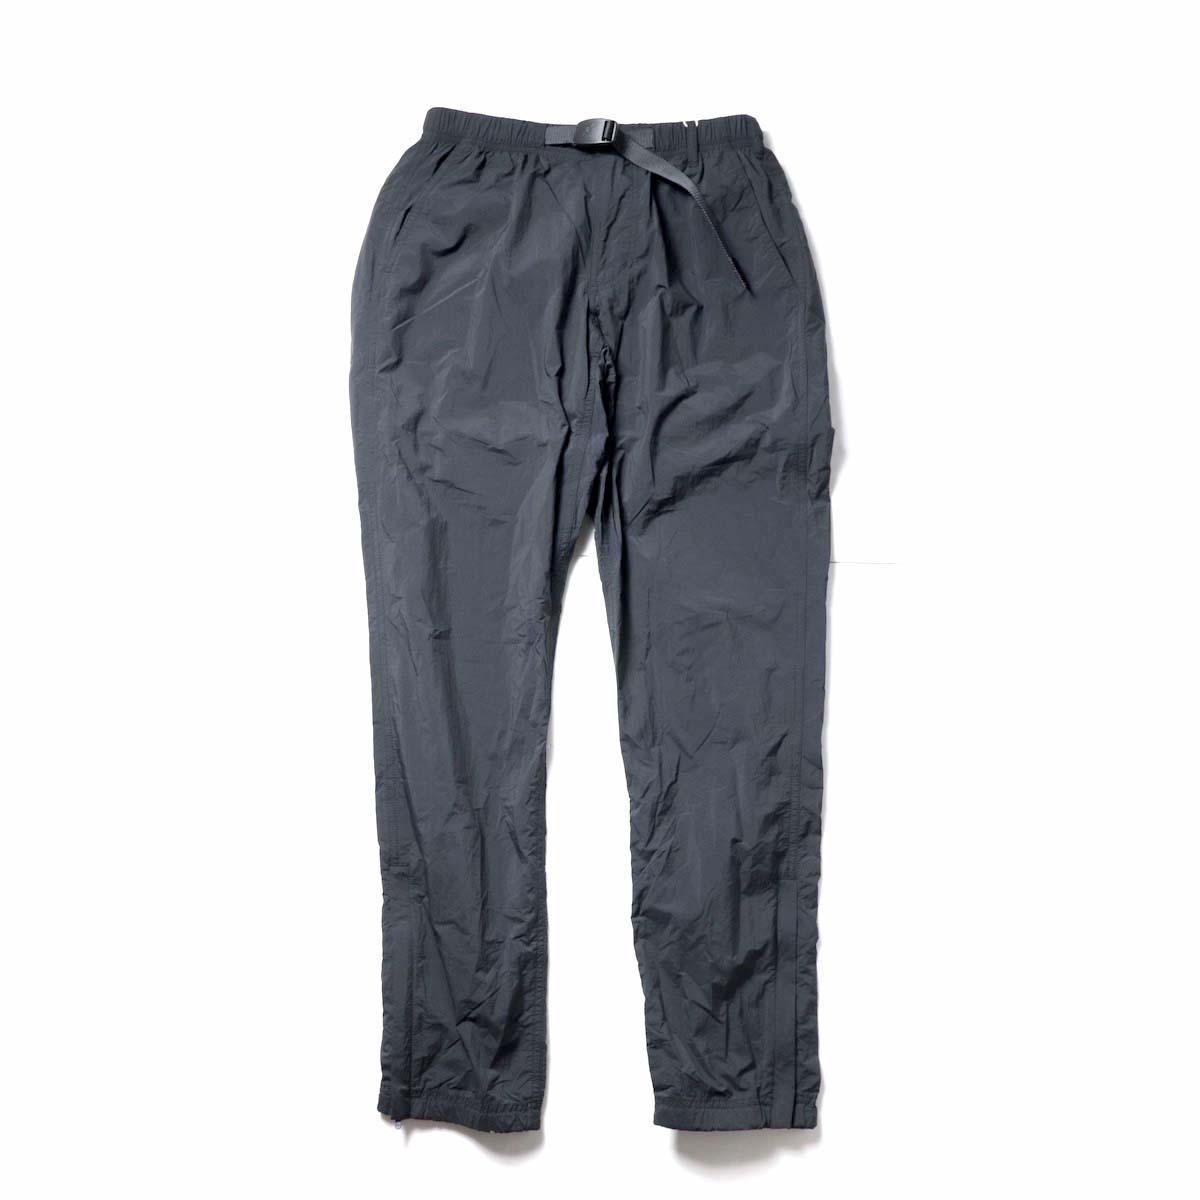 GRAMICCI / PACKABLE TRACK PANTS (Black)